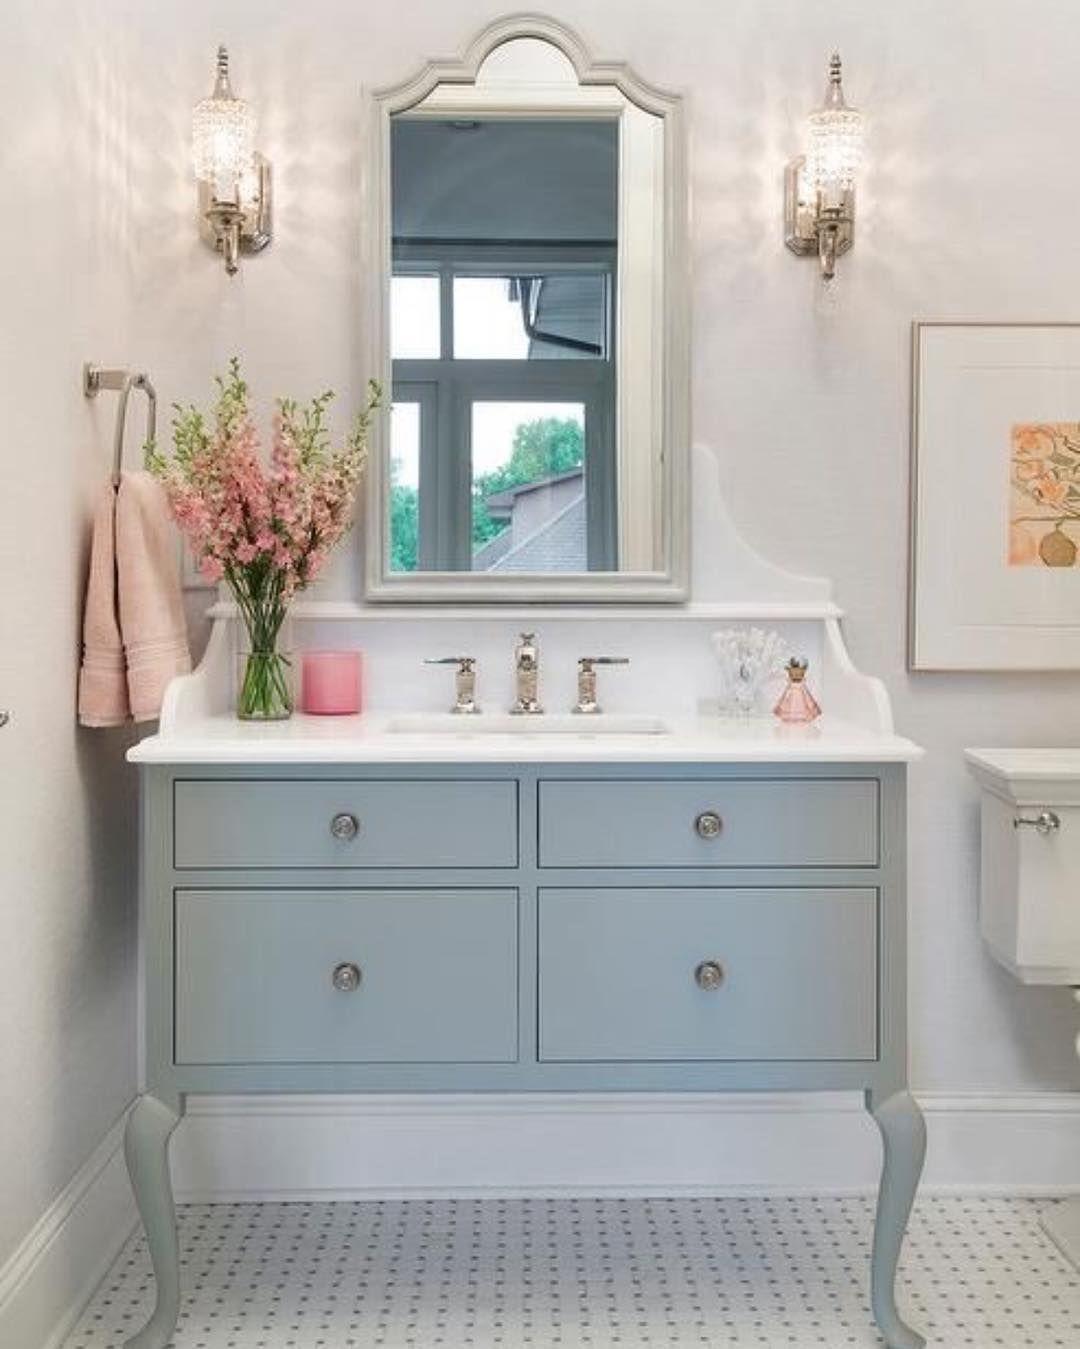 Pin by susanna dickinson on bathroom ideas pinterest instagram